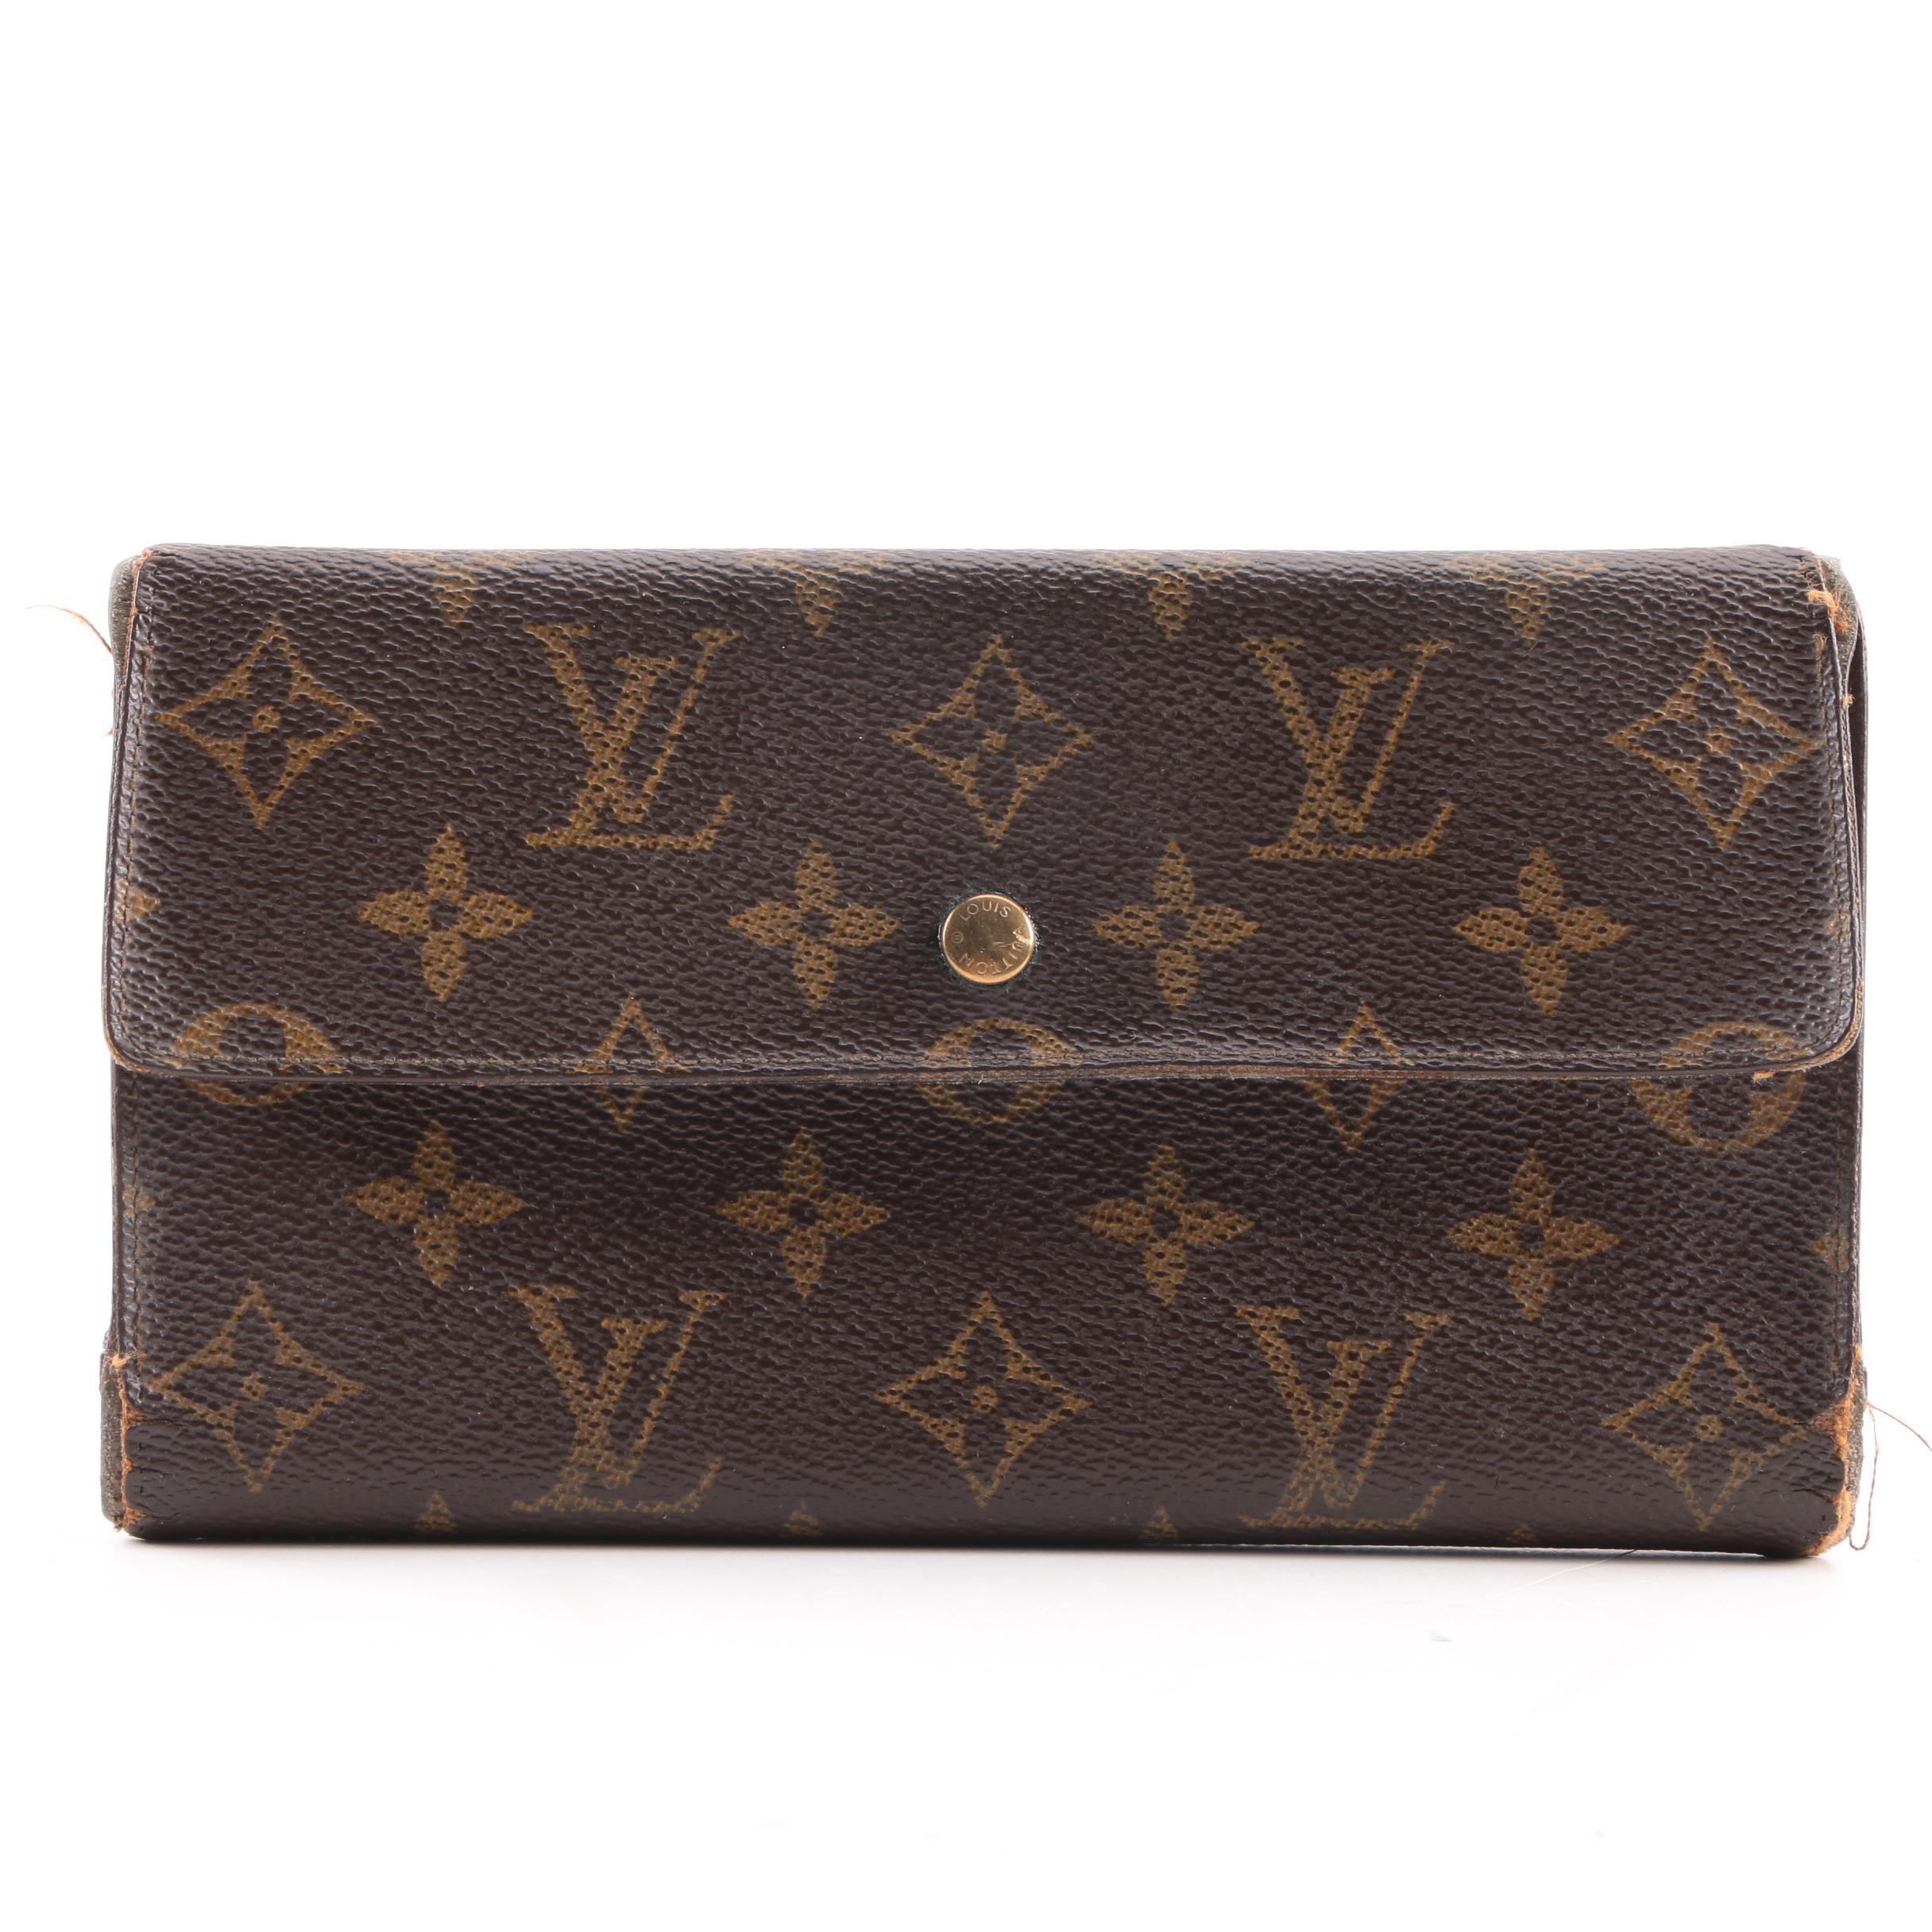 Vintage Louis Vuitton Malletier Monogram Wallet